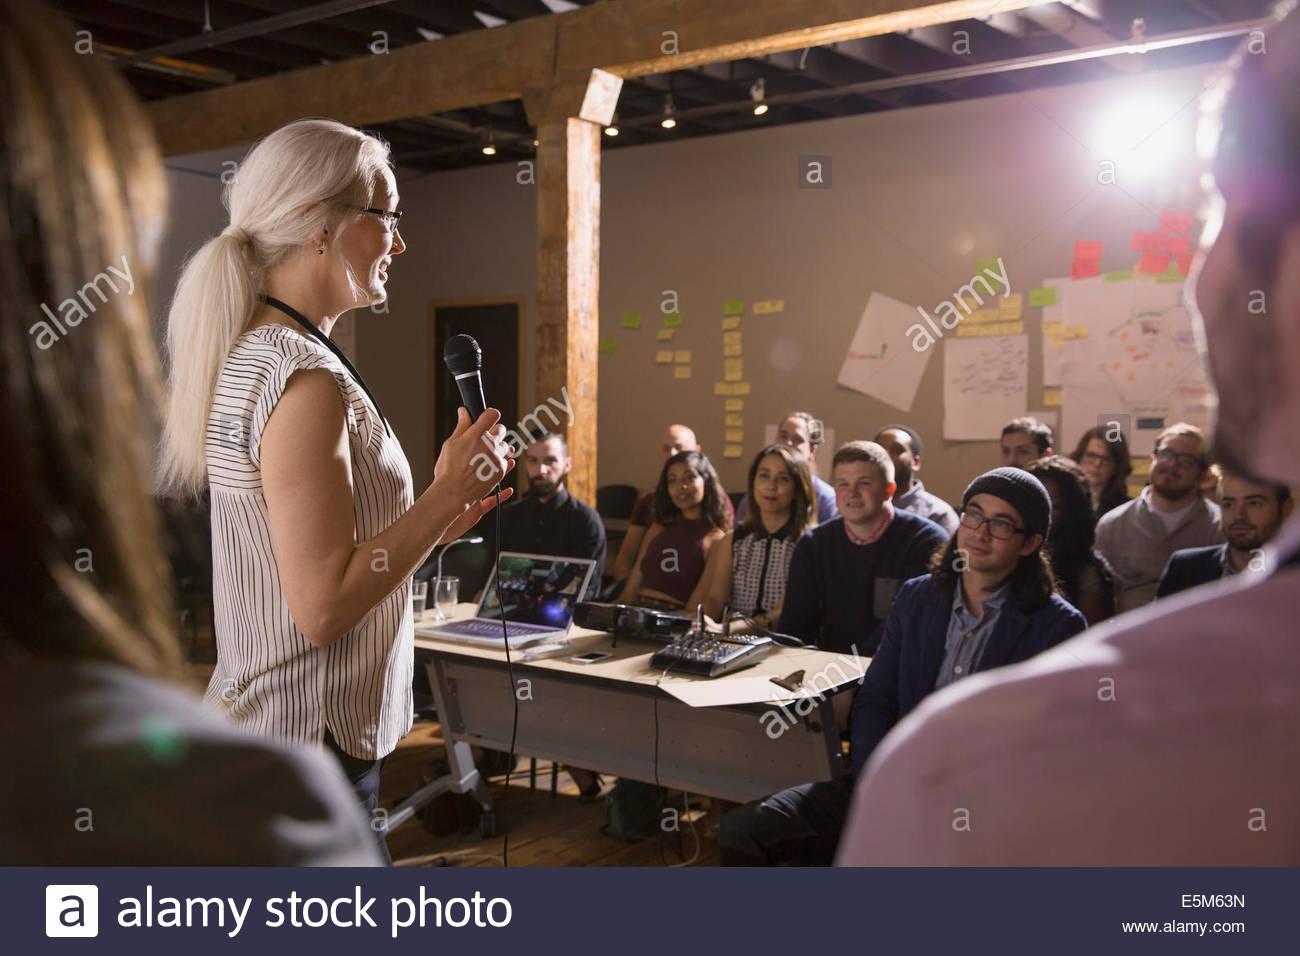 Audience listening to speaker - Stock Image